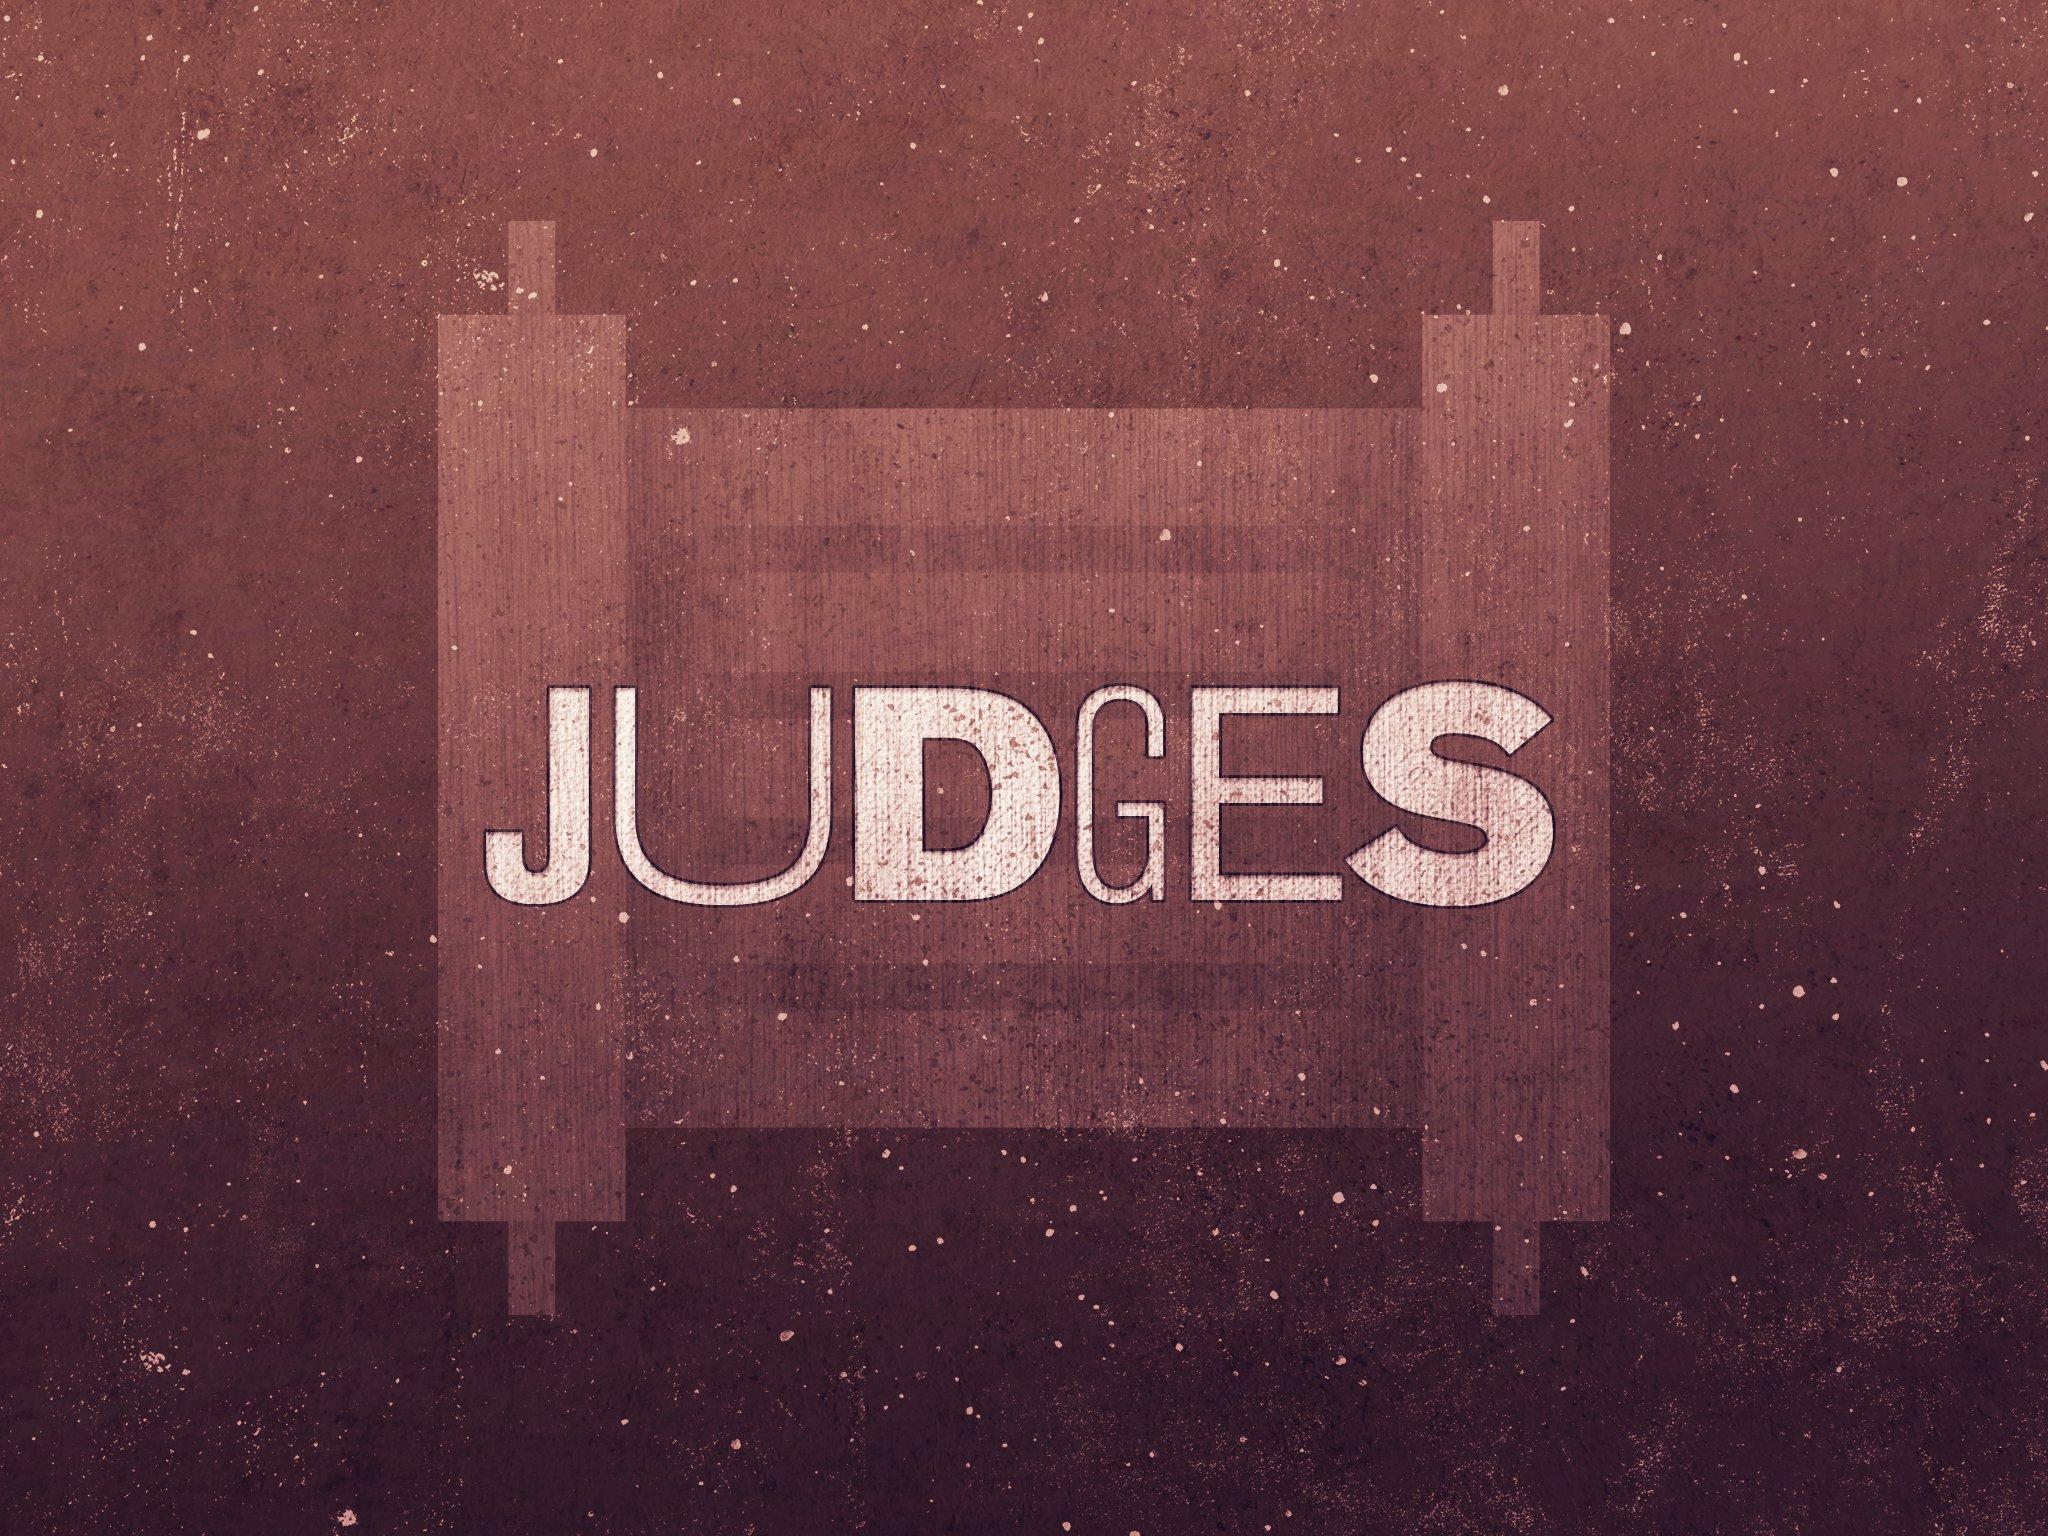 07-Judges_Title_4x3-fullscreen.jpg